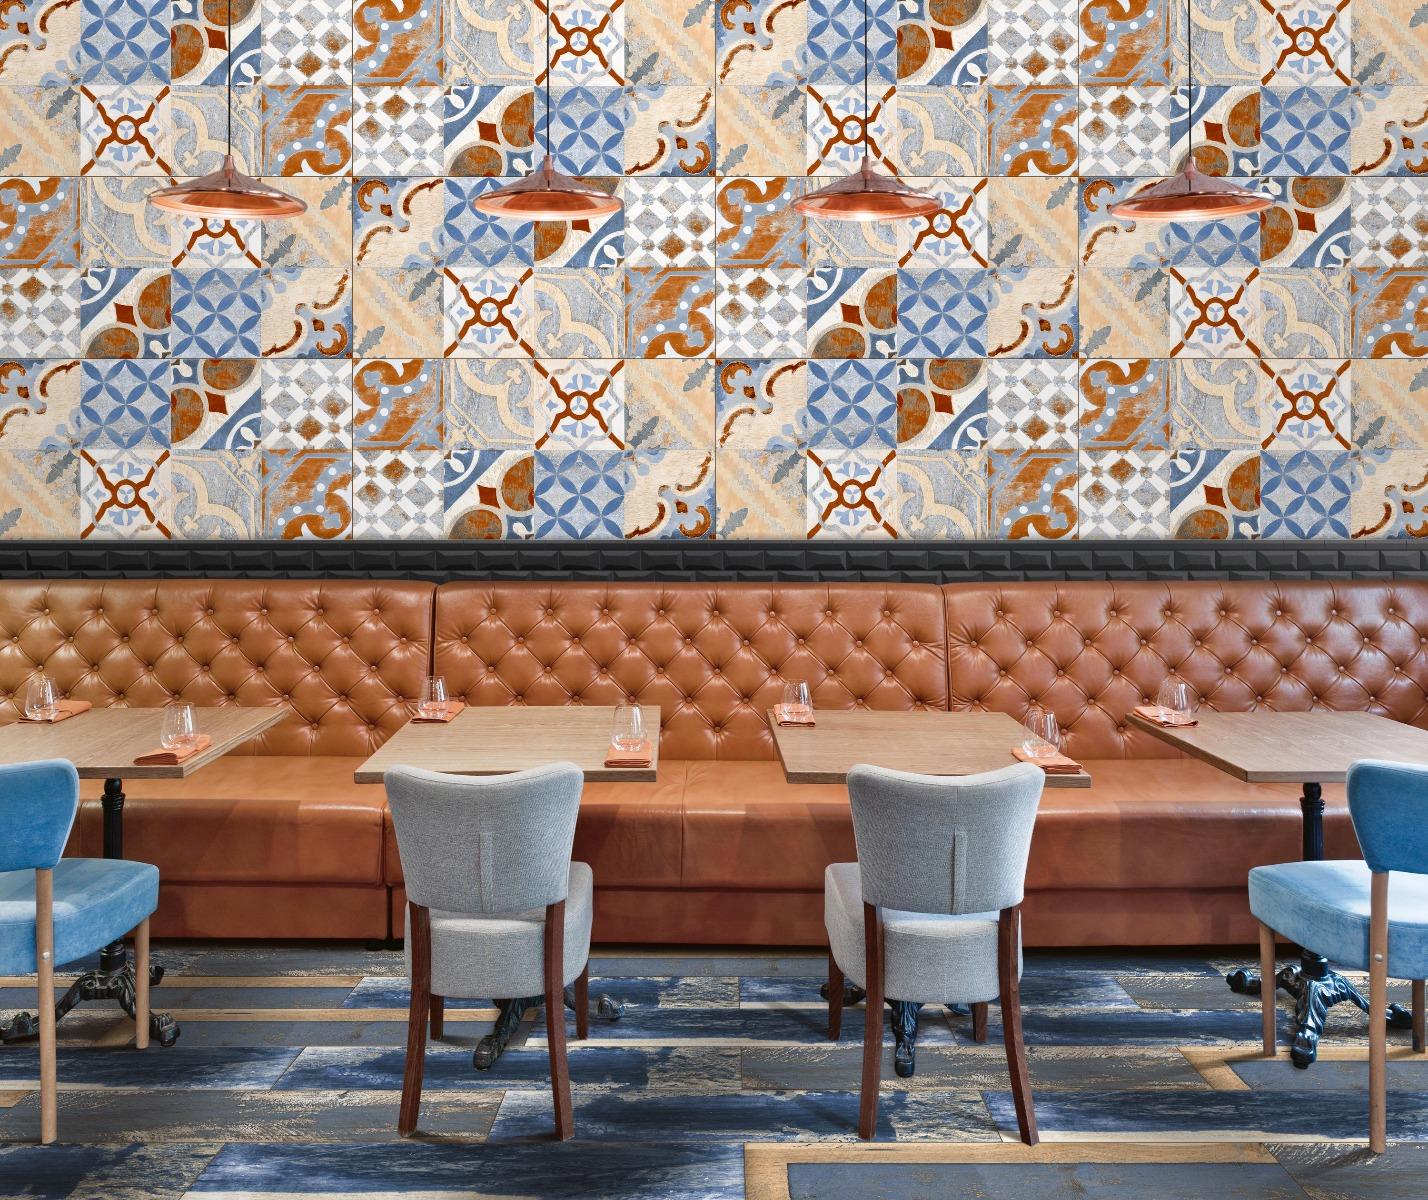 DGVT Mosaic Art Decor